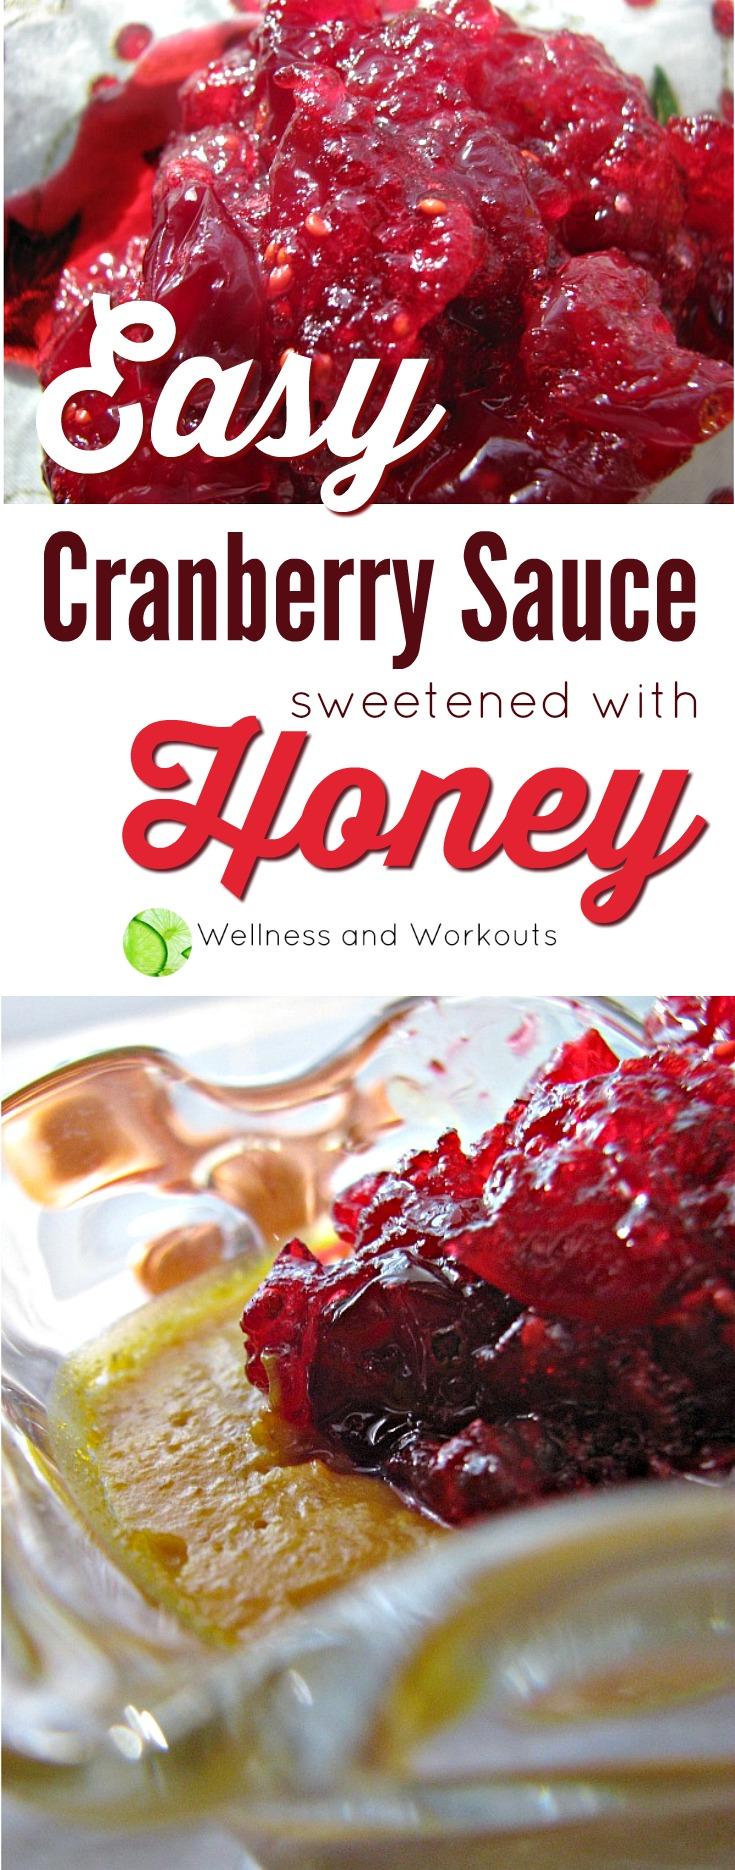 Easy Cranberry Sauce Recipe with Honey--GAPS Diet, SCD, Paleo/Primal